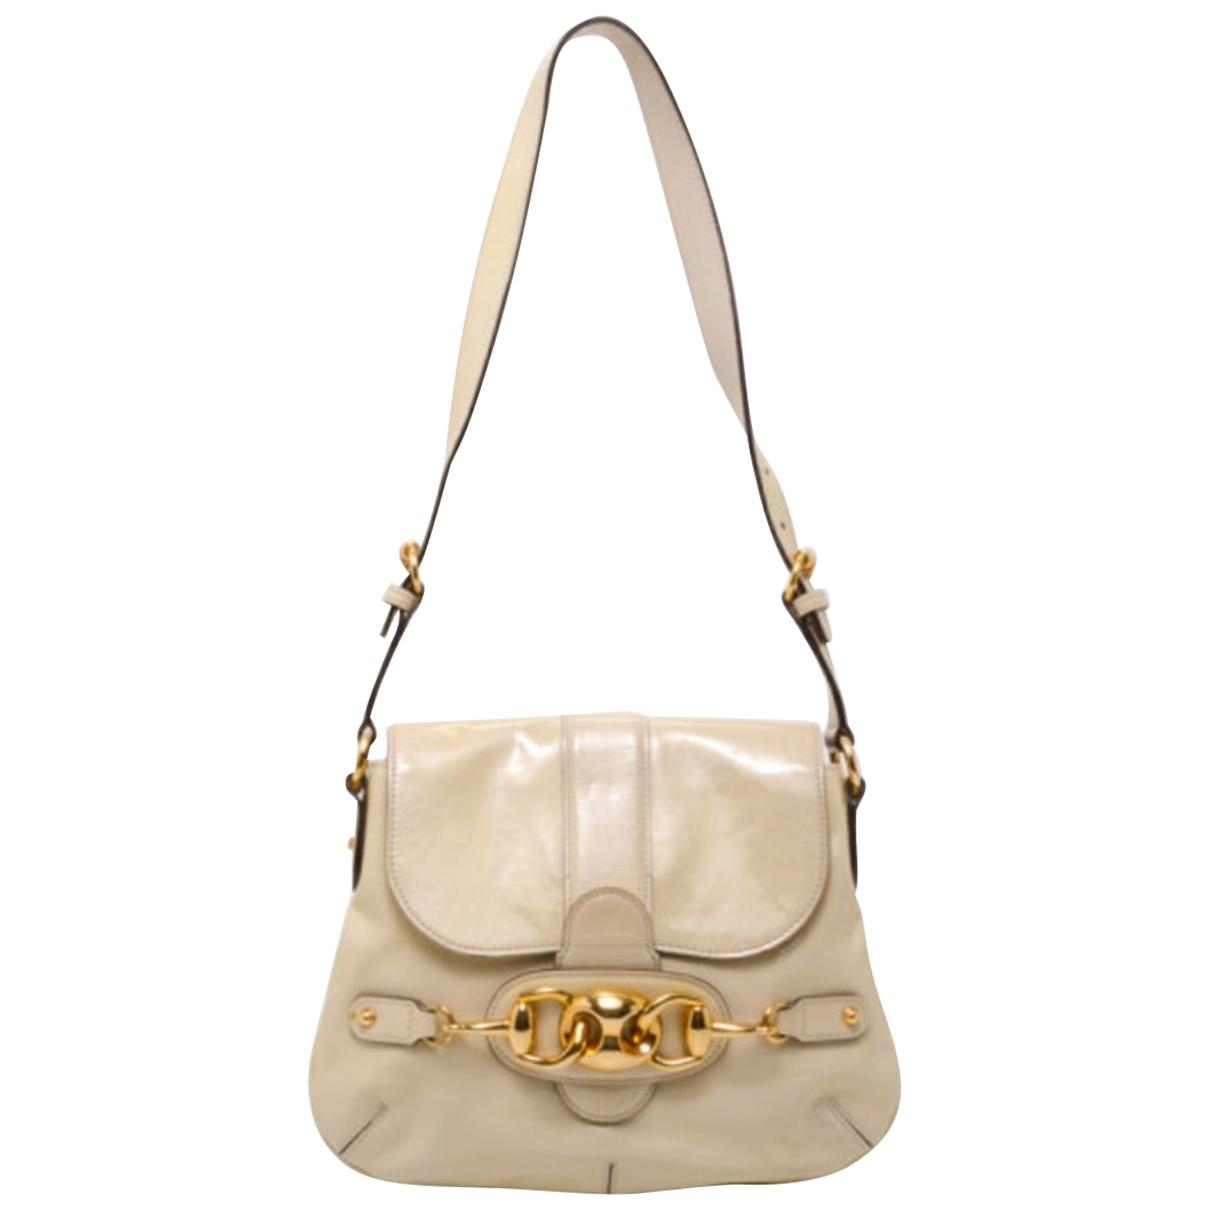 Gucci \N Handtasche in  Ecru Lackleder